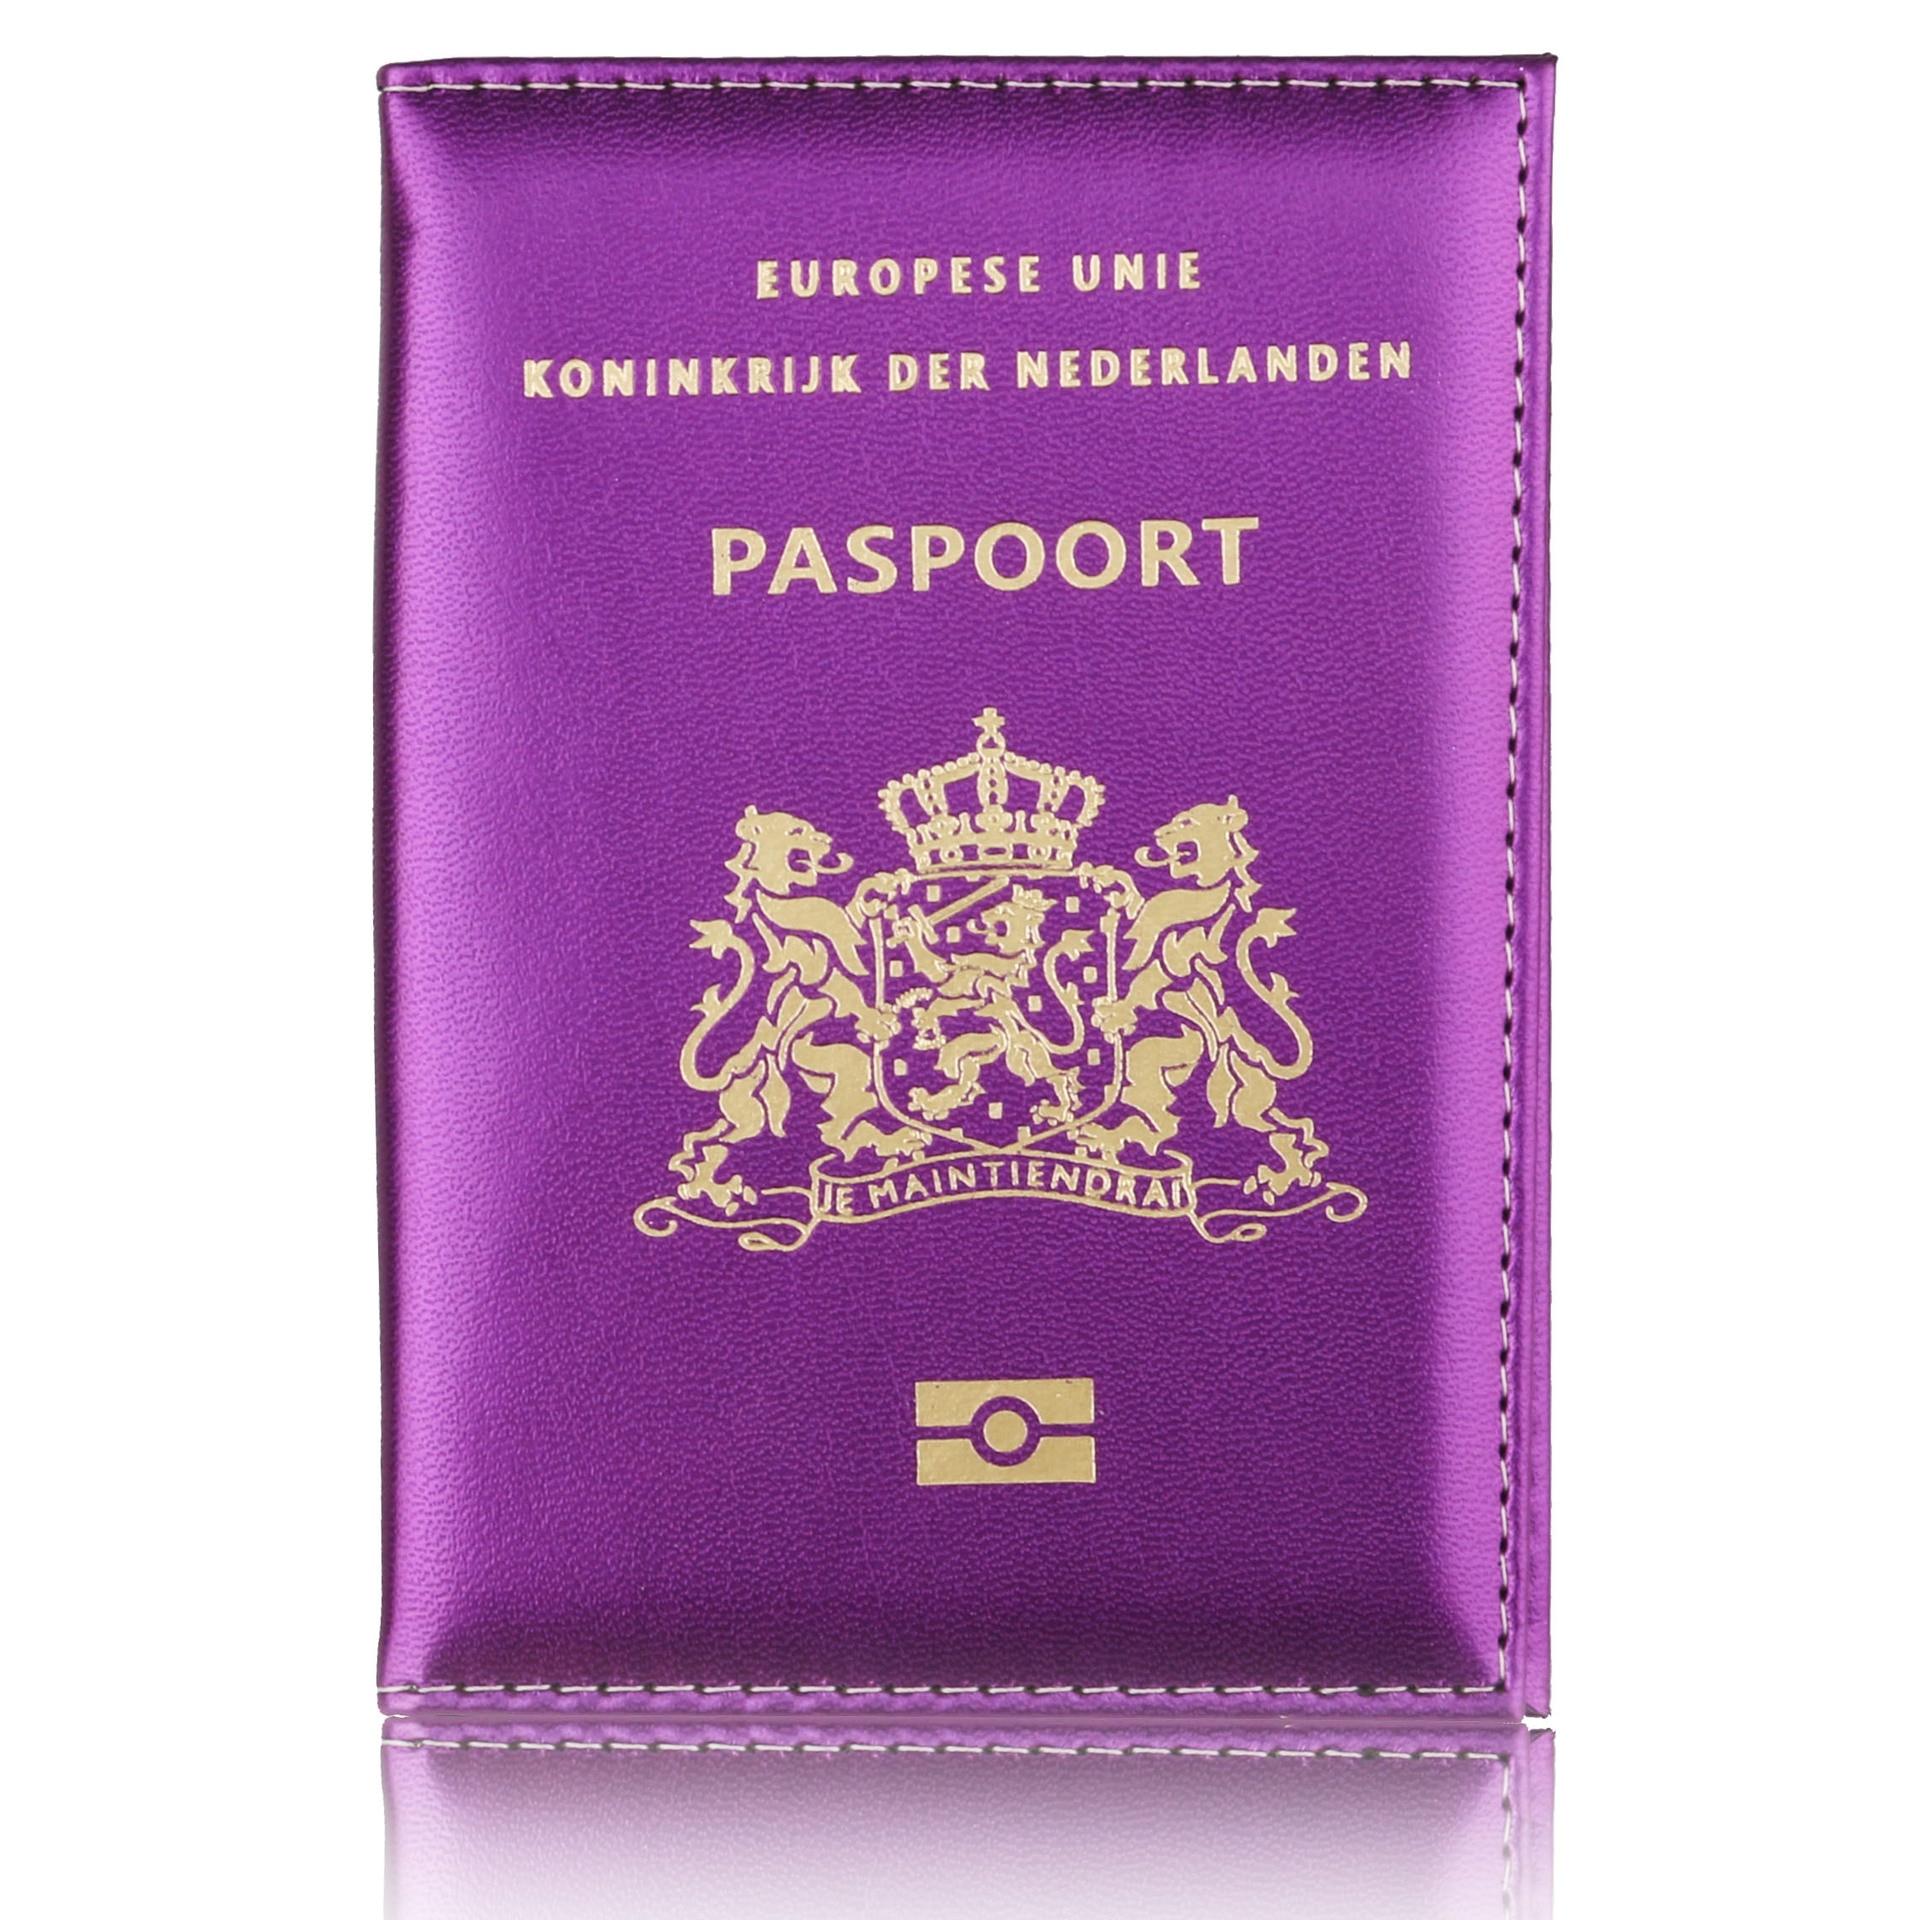 Passport Cover Soft Pu Leather Women Men Passport Holder Paspoort Card Protector